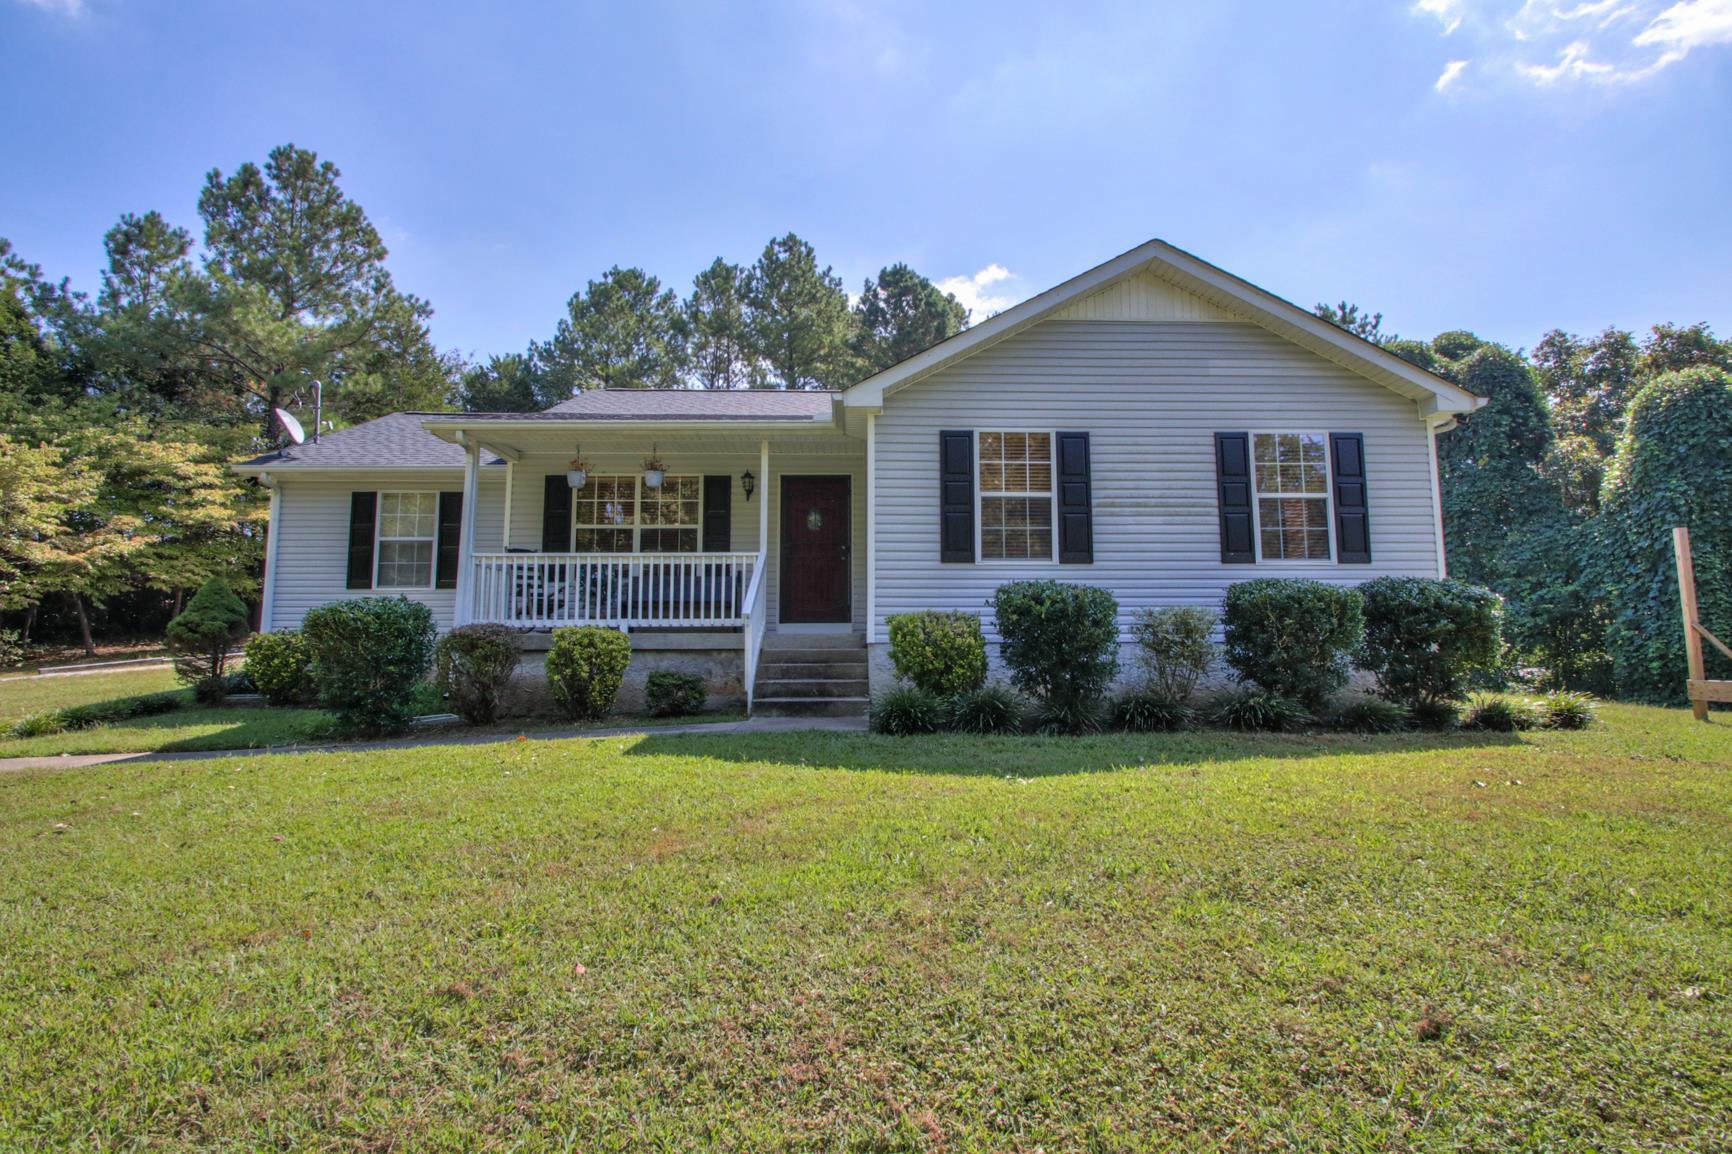 1373 Porter Morris Rd, Chapmansboro, TN 37035 - Chapmansboro, TN real estate listing